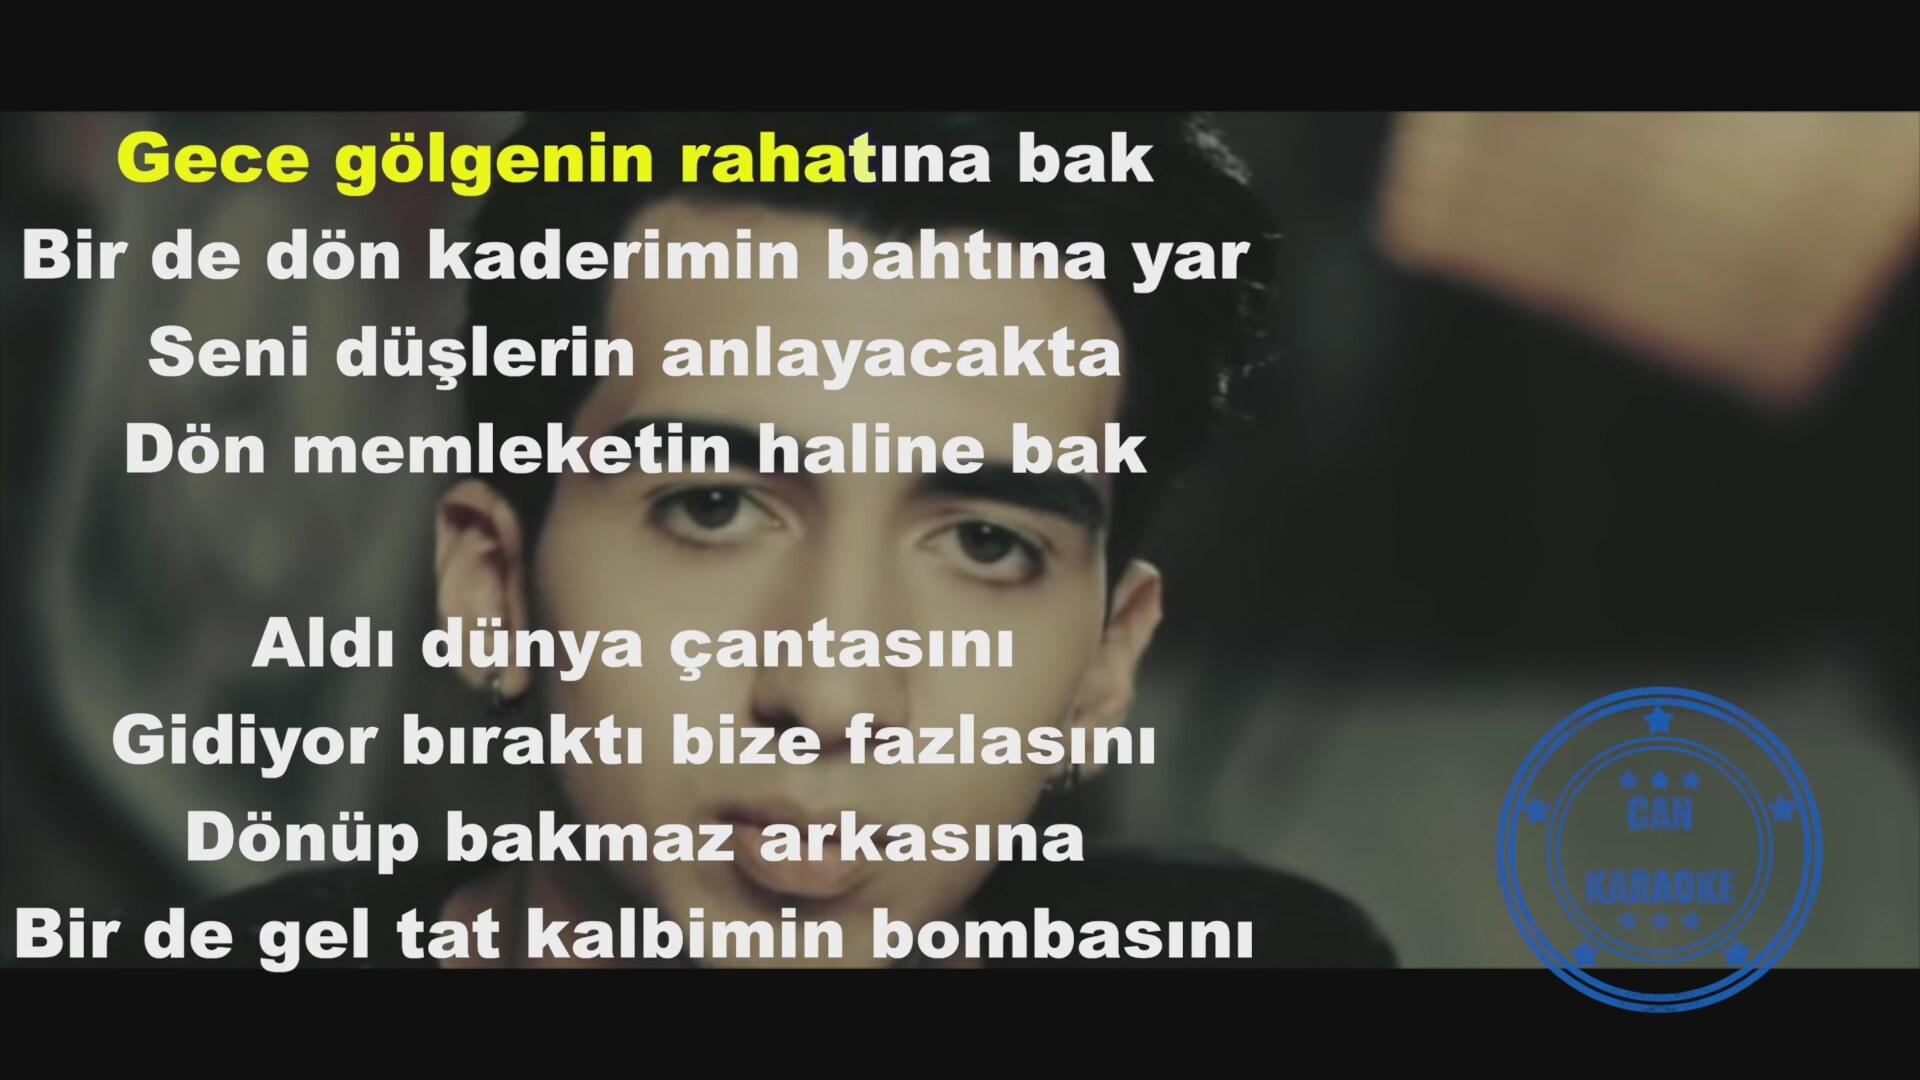 Gece Golgenin Rahatina Bak Kore Klip Youtube